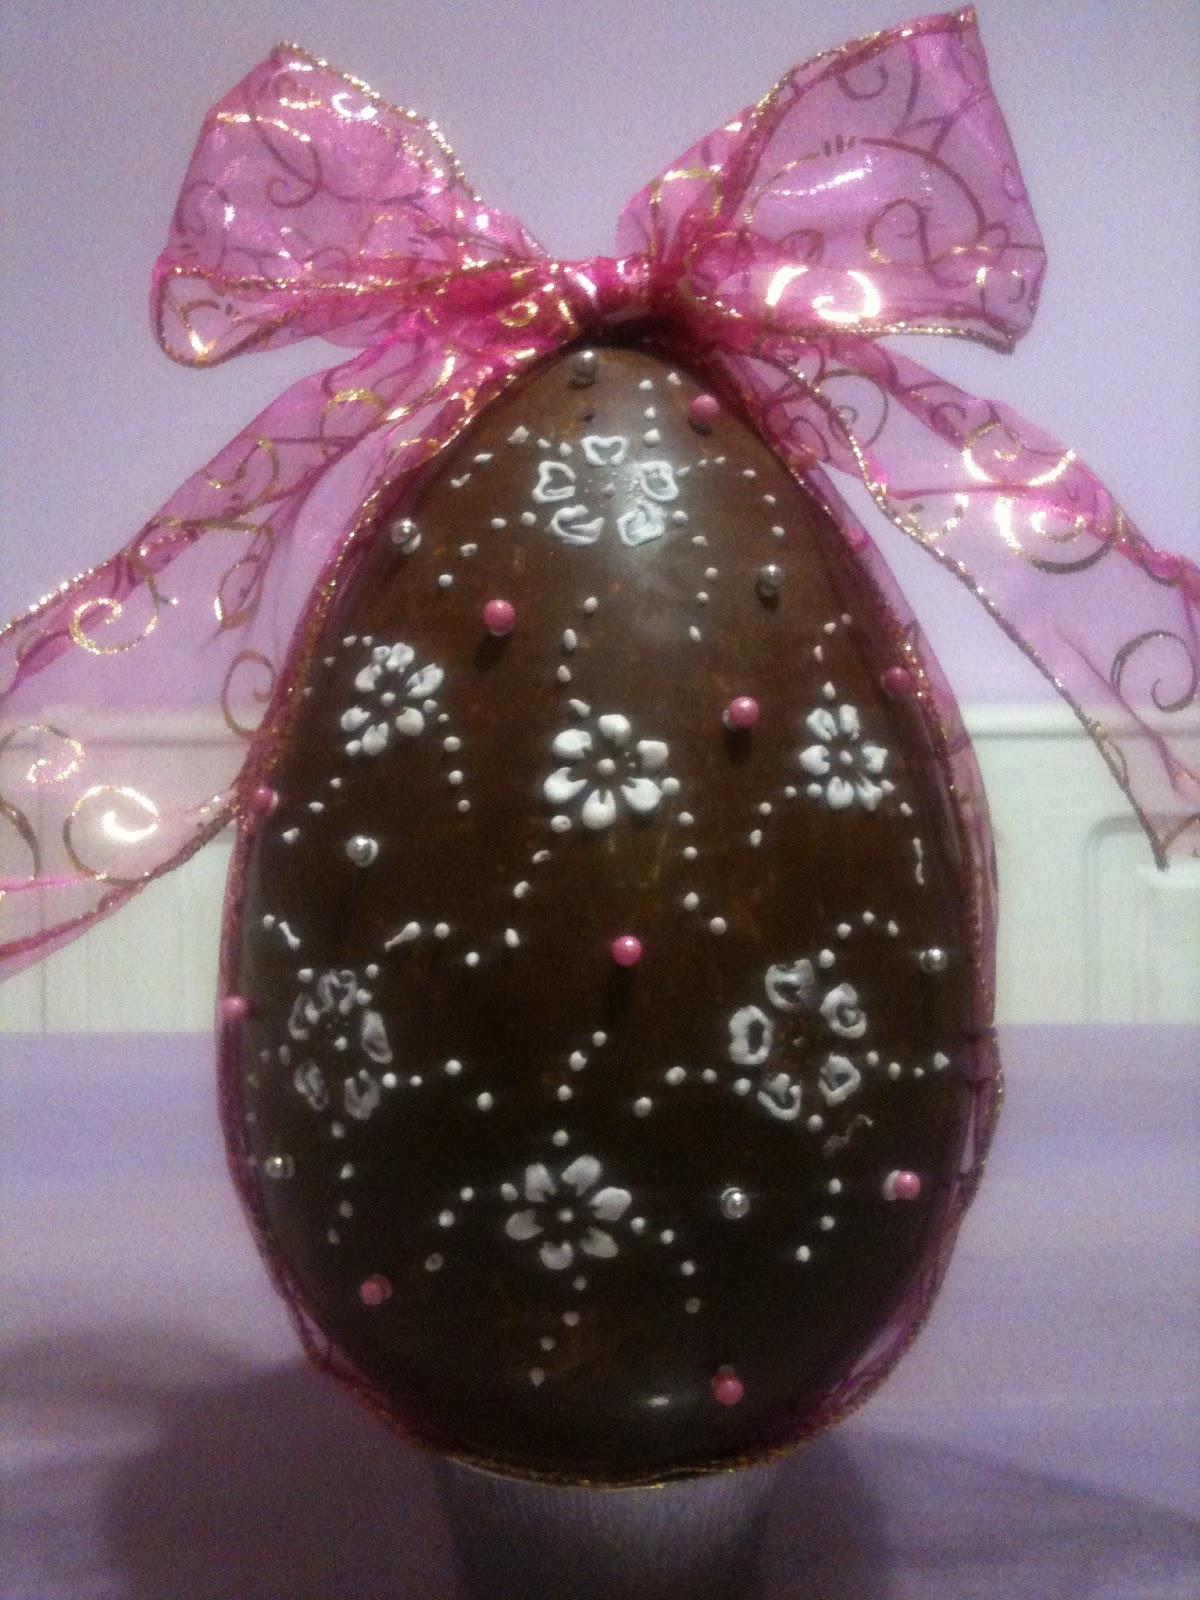 A casa di lory uova di pasqua decorate - Uova di pasqua decorati a mano ...